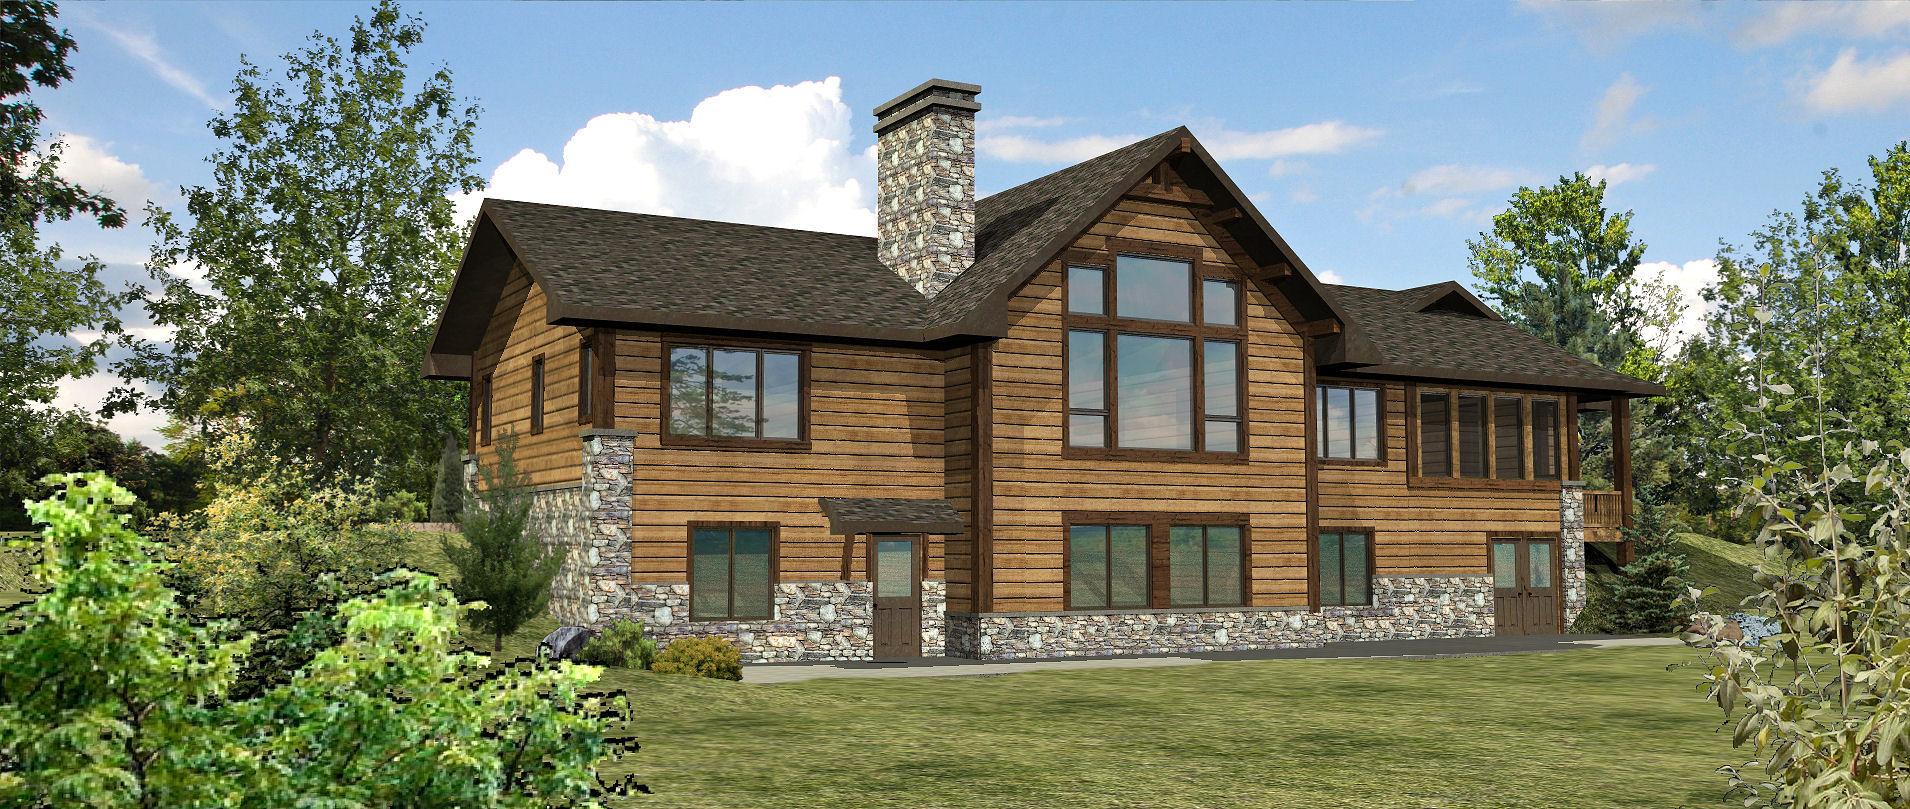 Woodruff - Rear Rendering by Wisconsin Log Homes